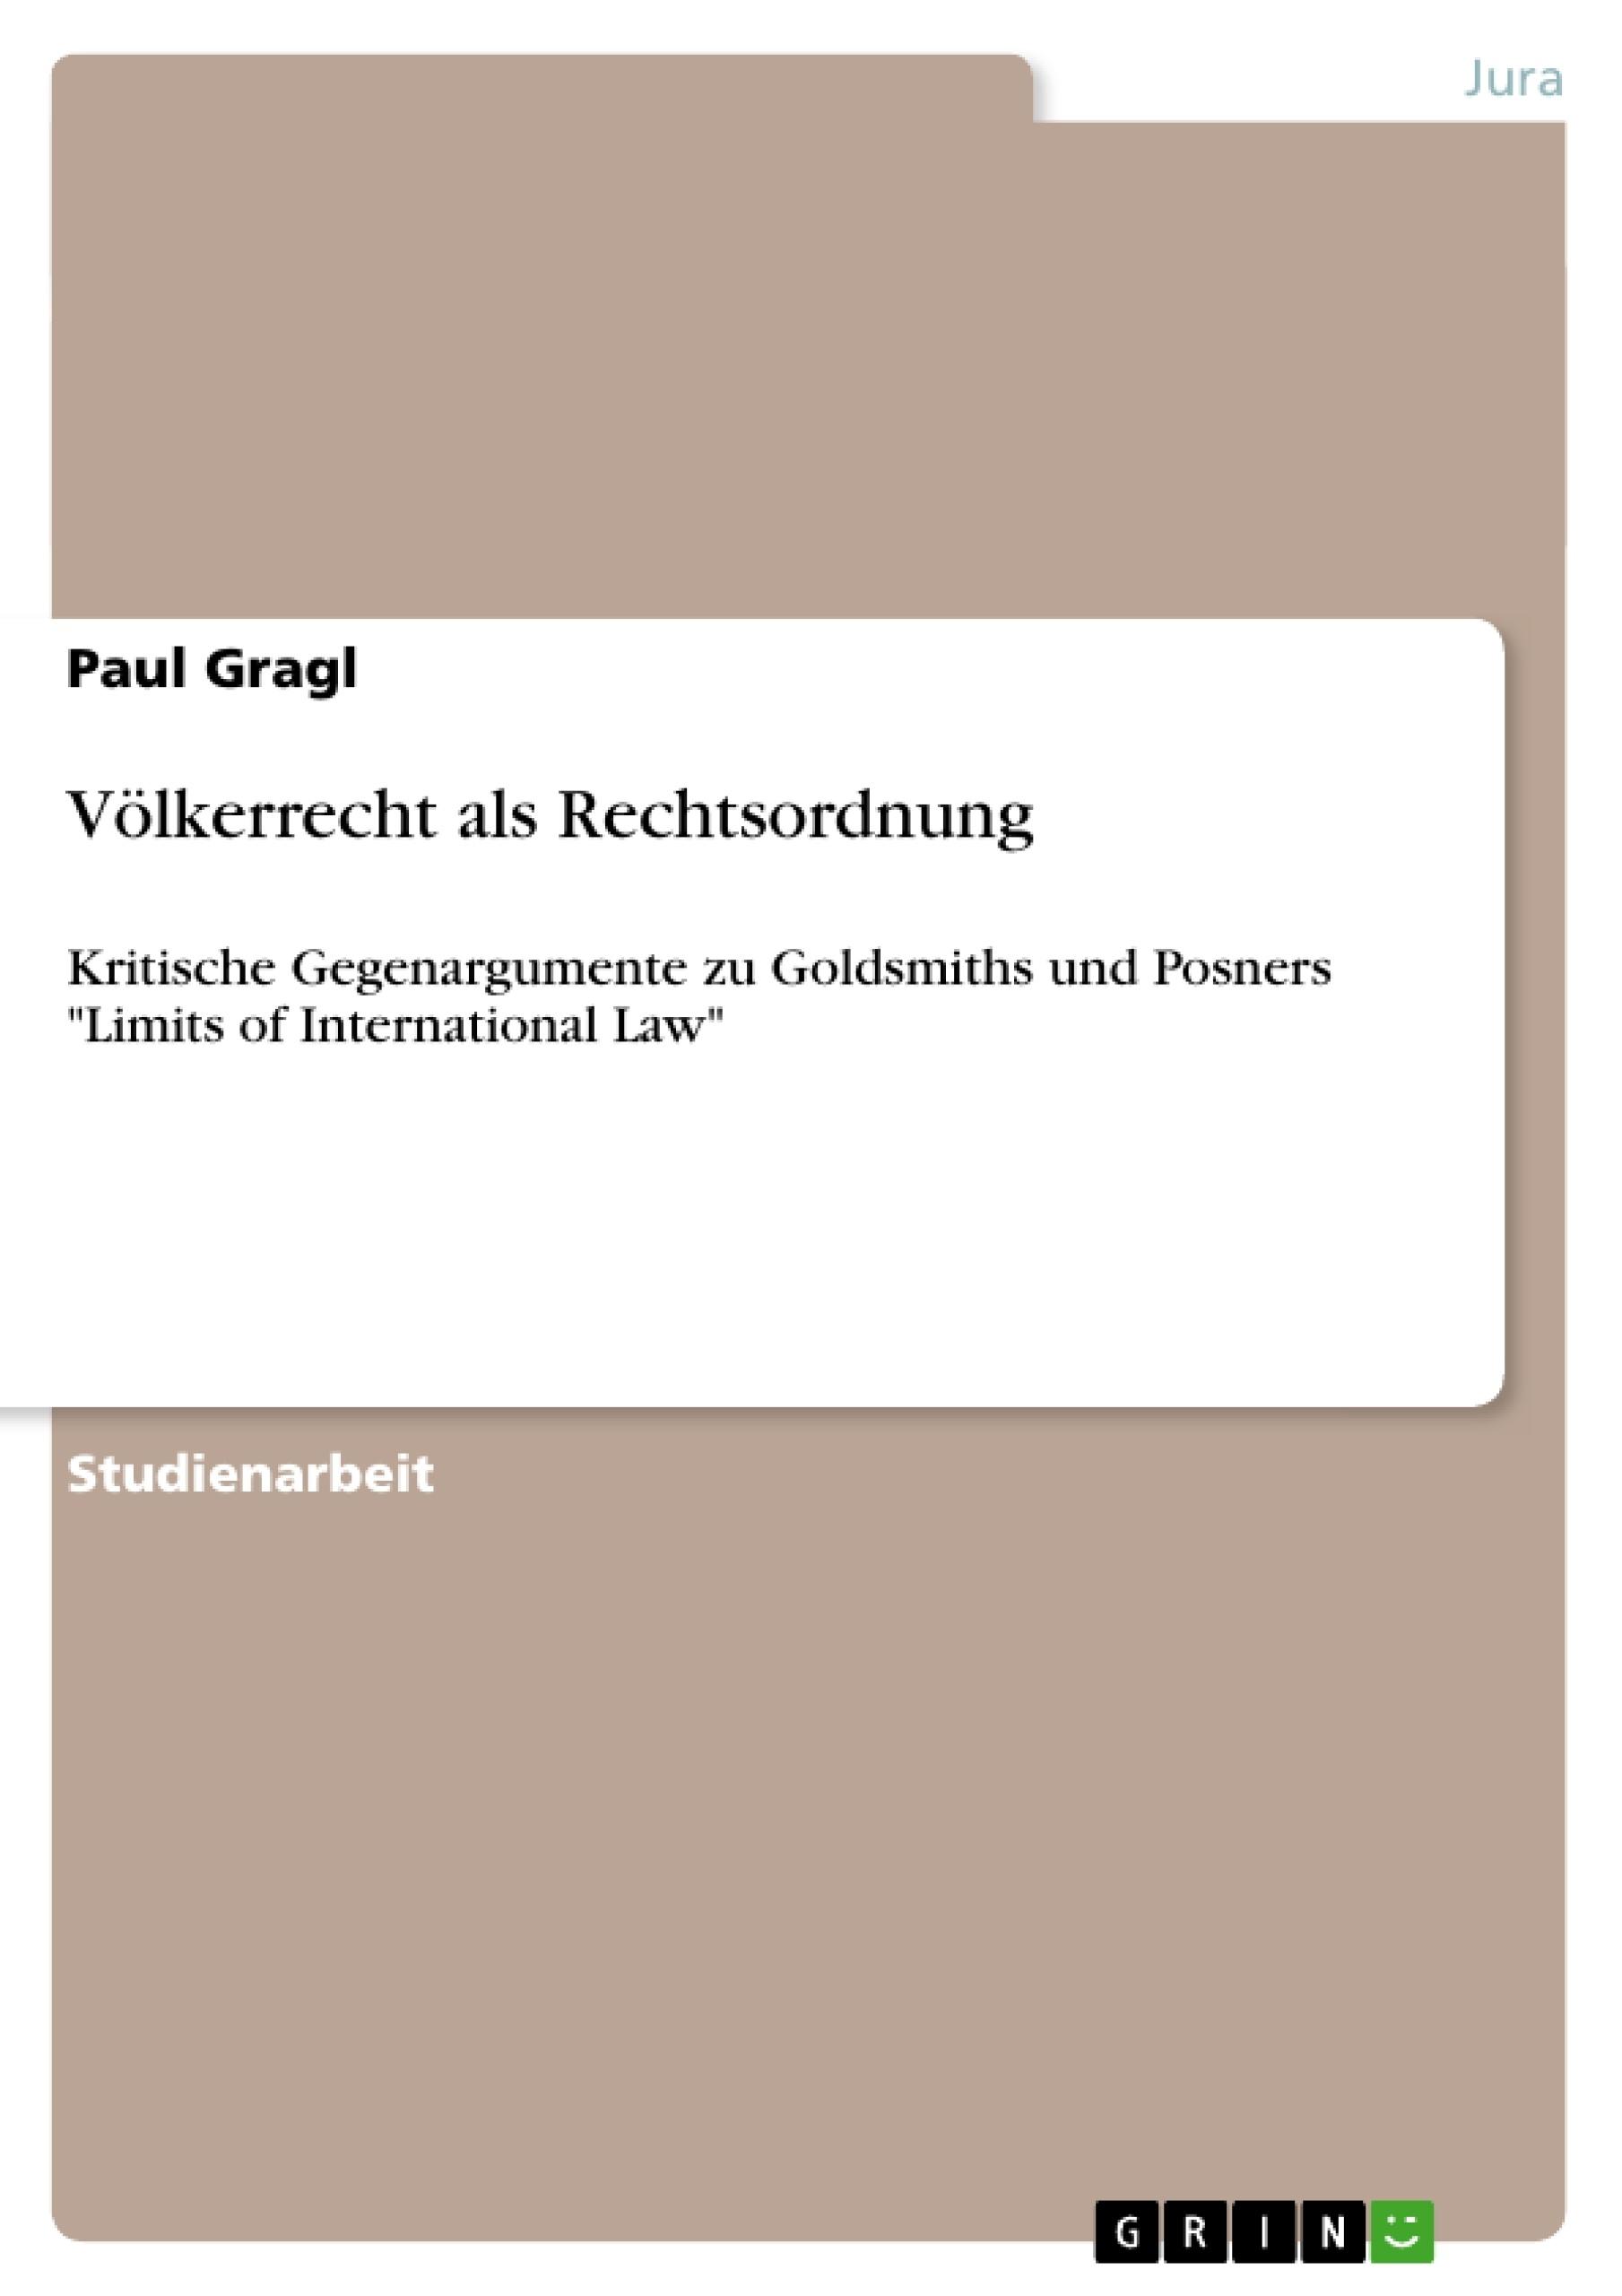 Titel: Völkerrecht als Rechtsordnung